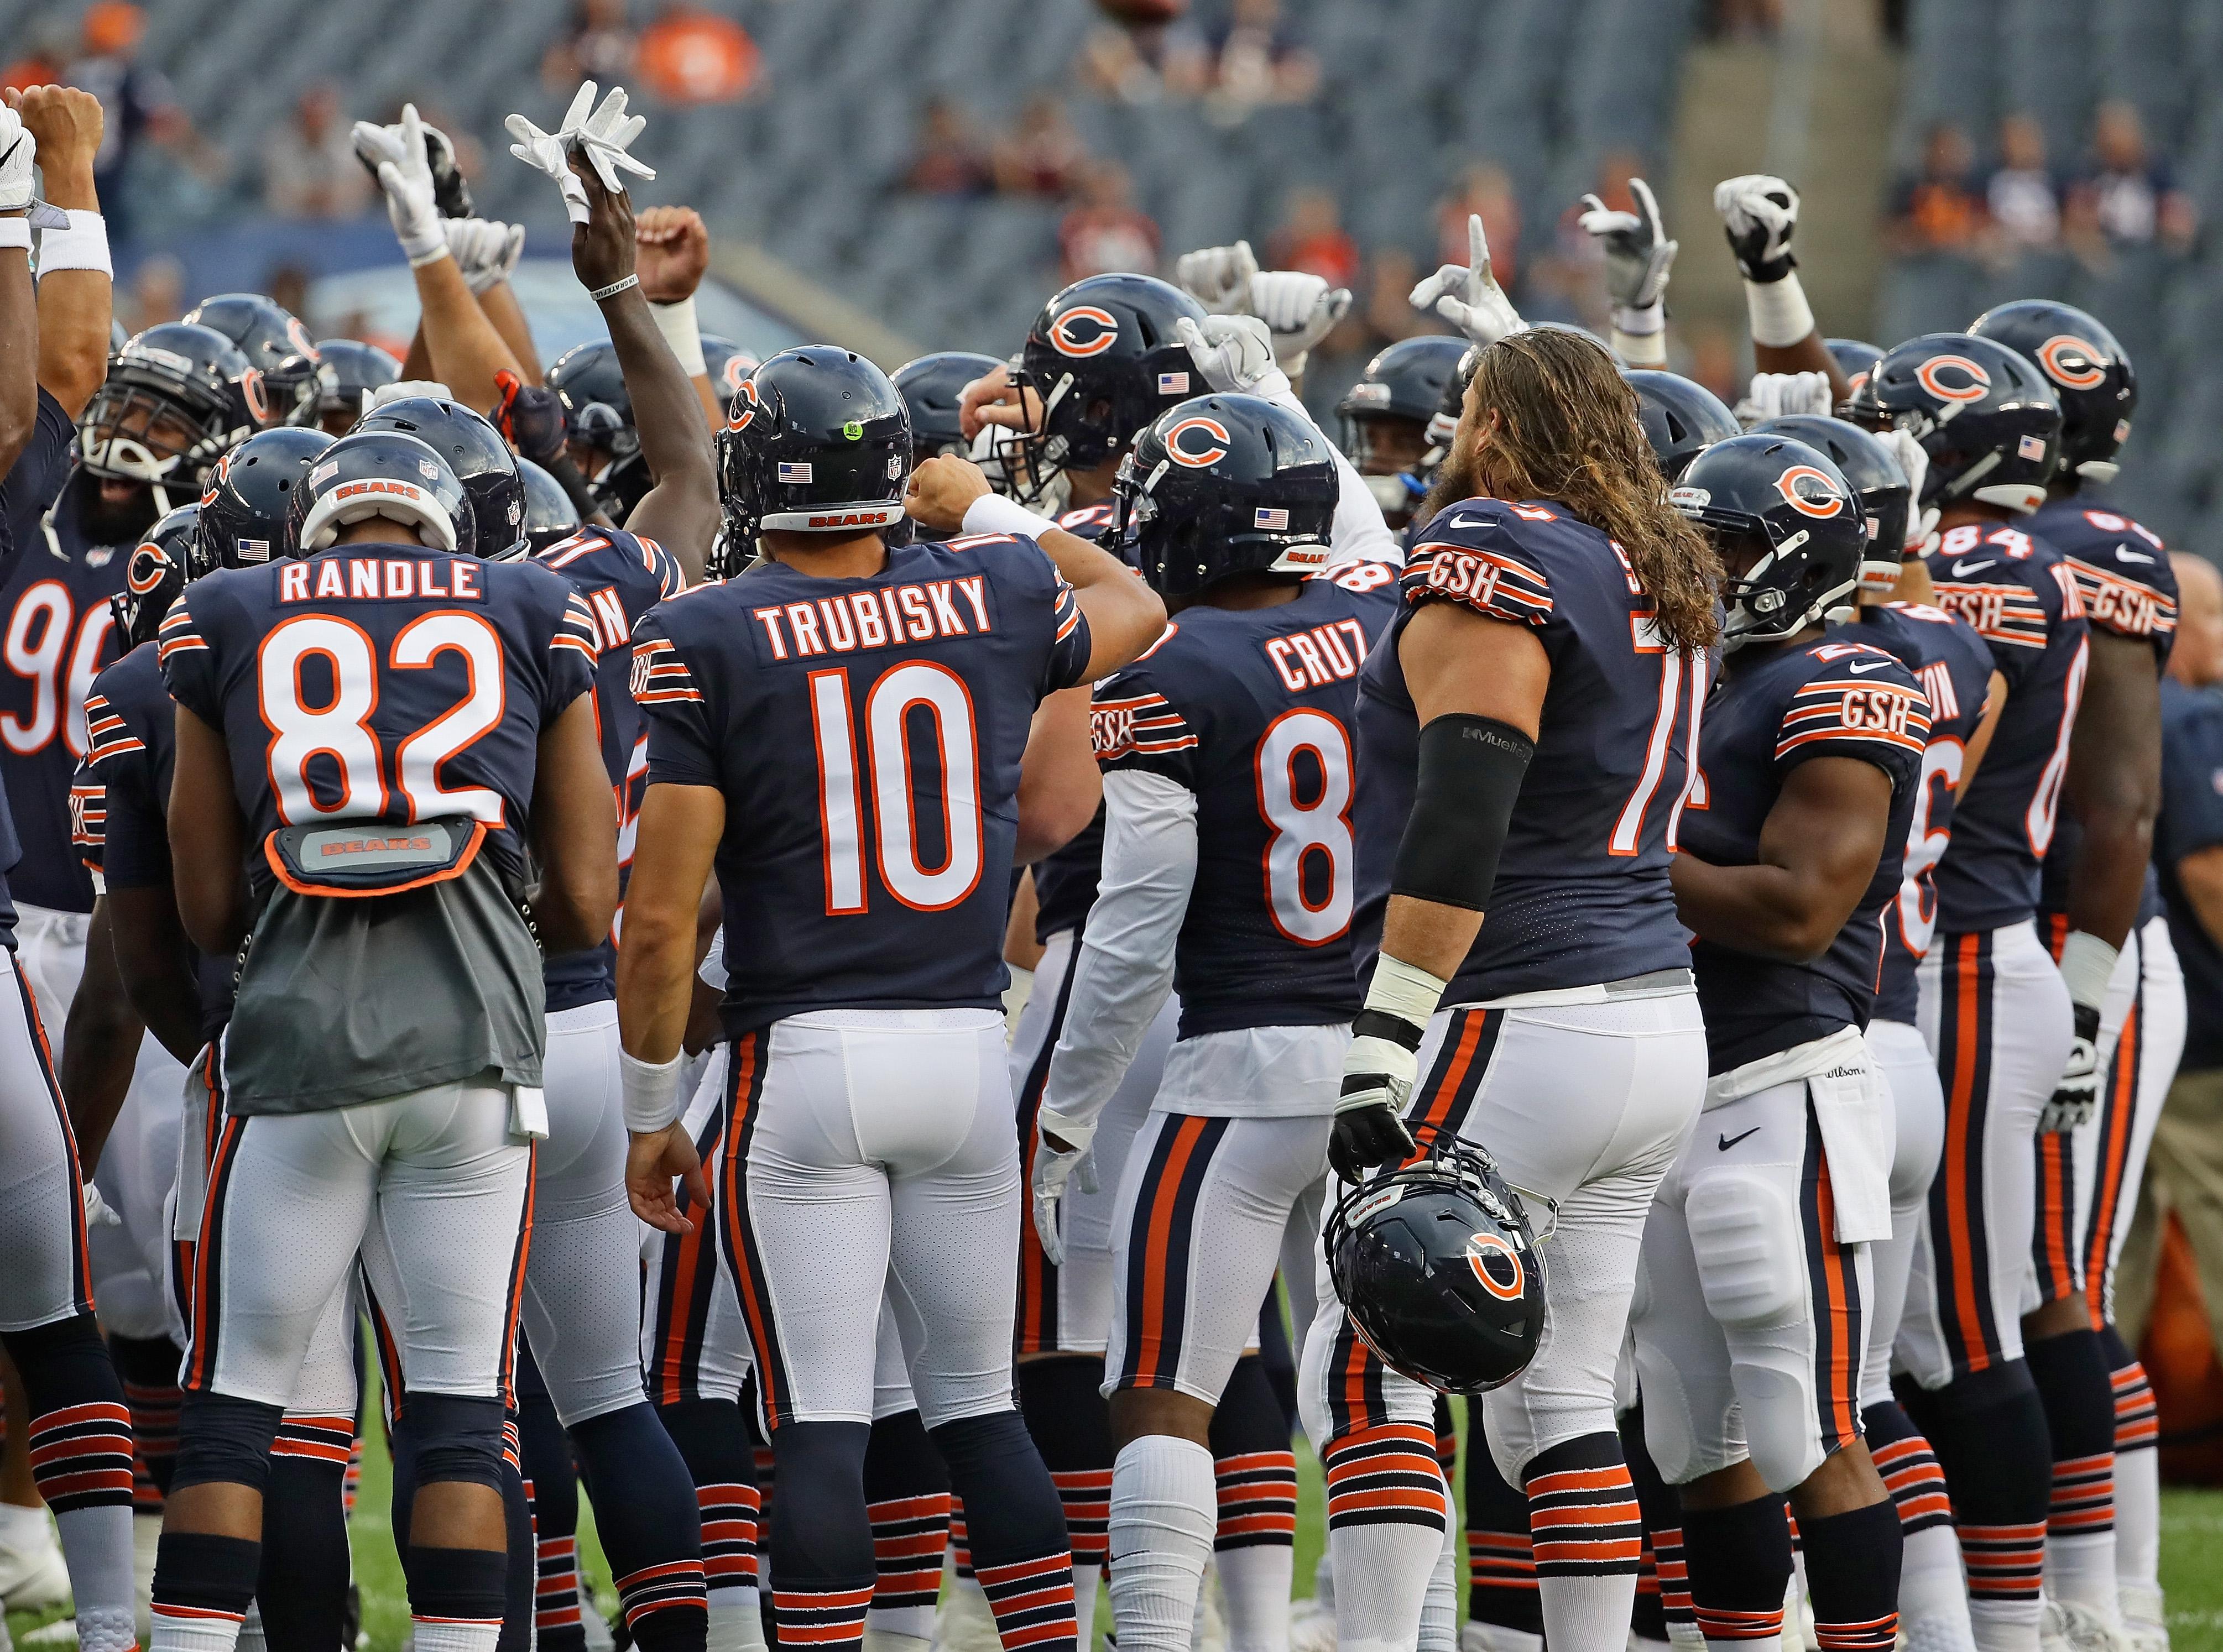 buy online b7b06 0d26a 2017 NFL Uniform Rankings - The Best of the Best